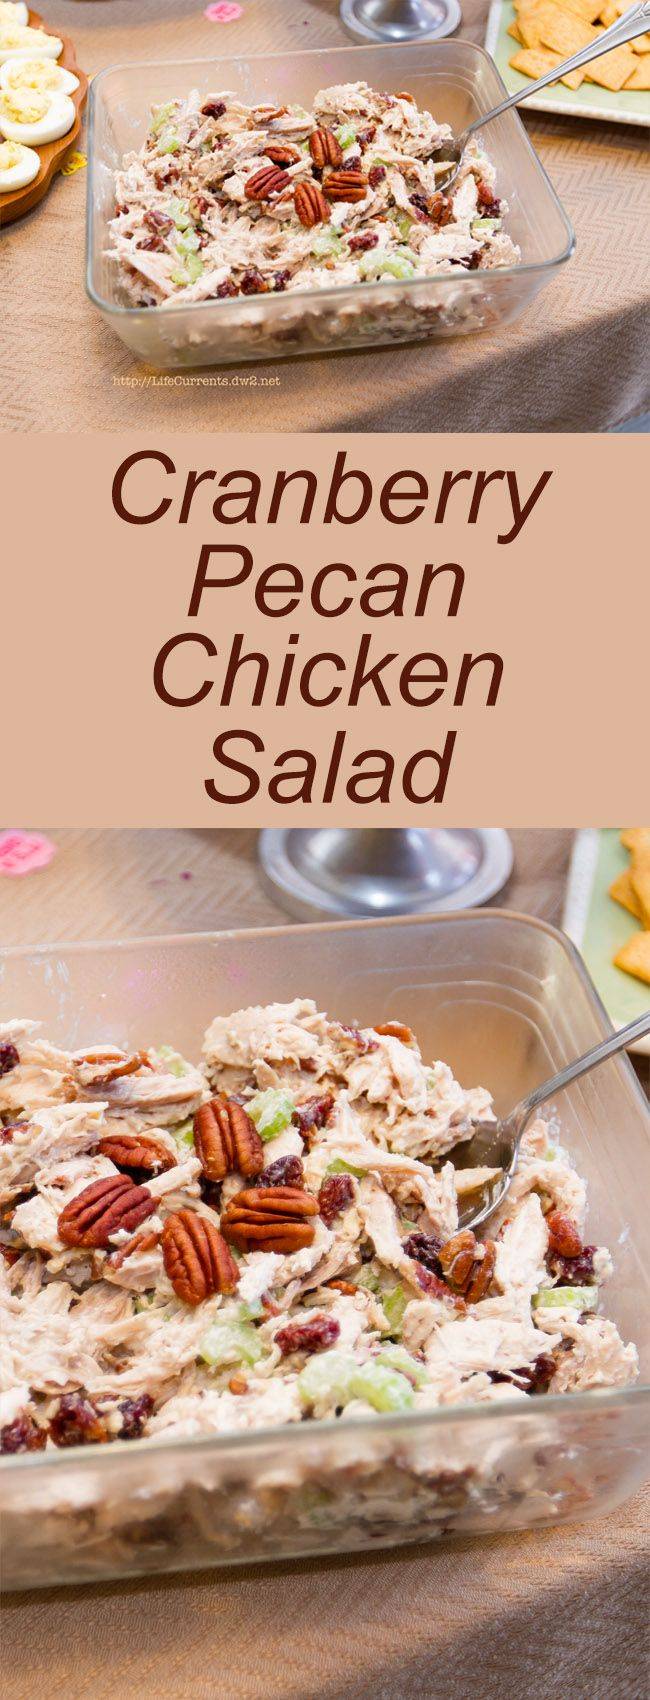 Cranberry Pecan Chicken Salad – Life Currents